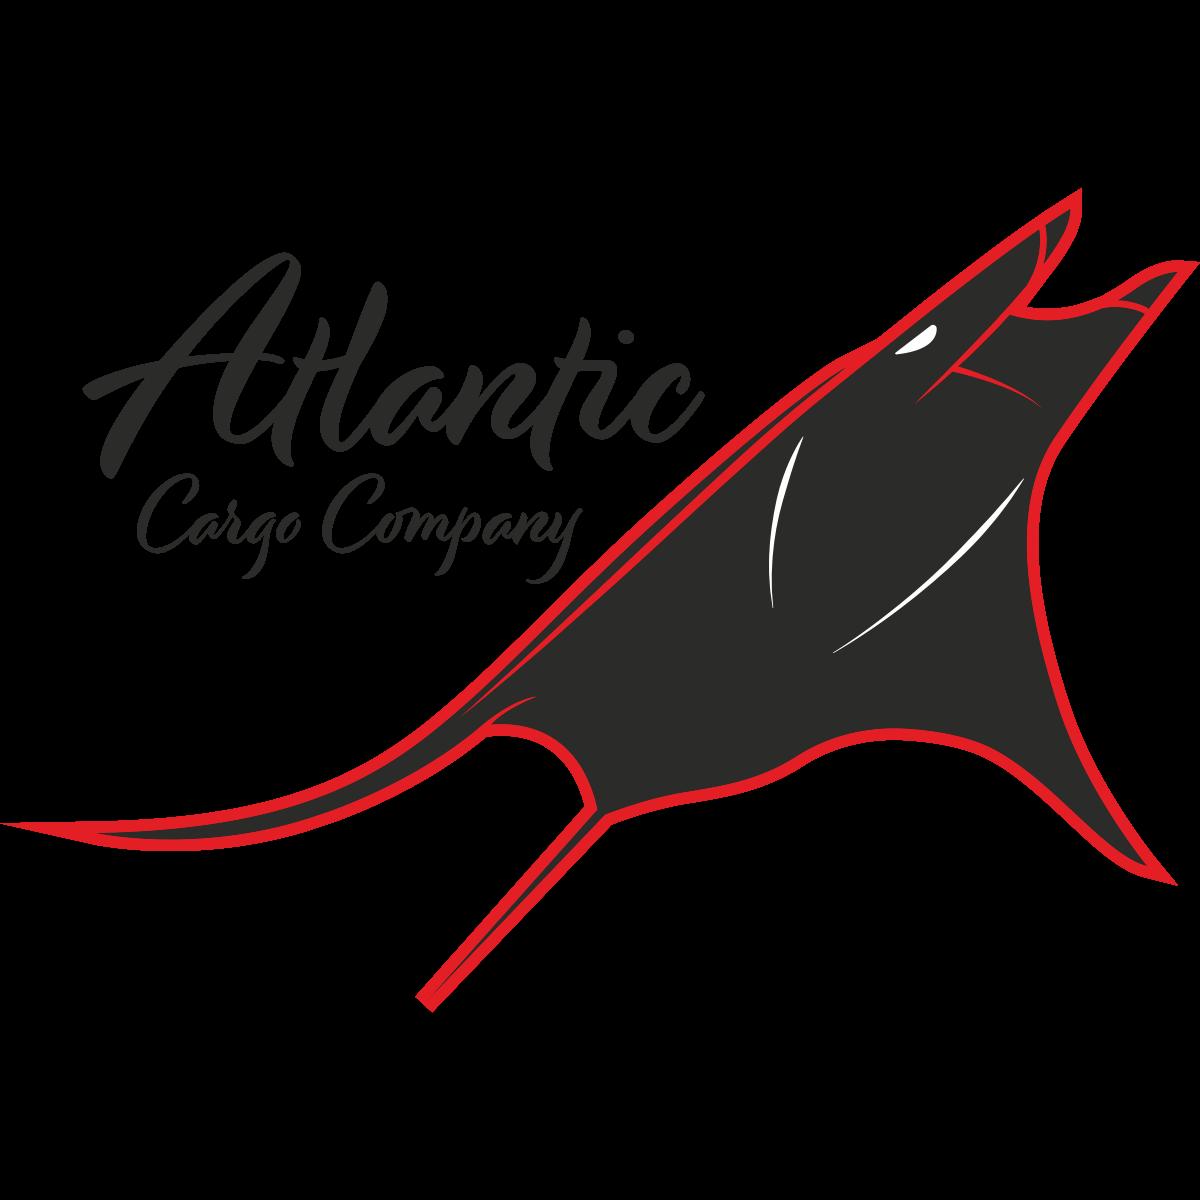 logo design and some t-shirt designs